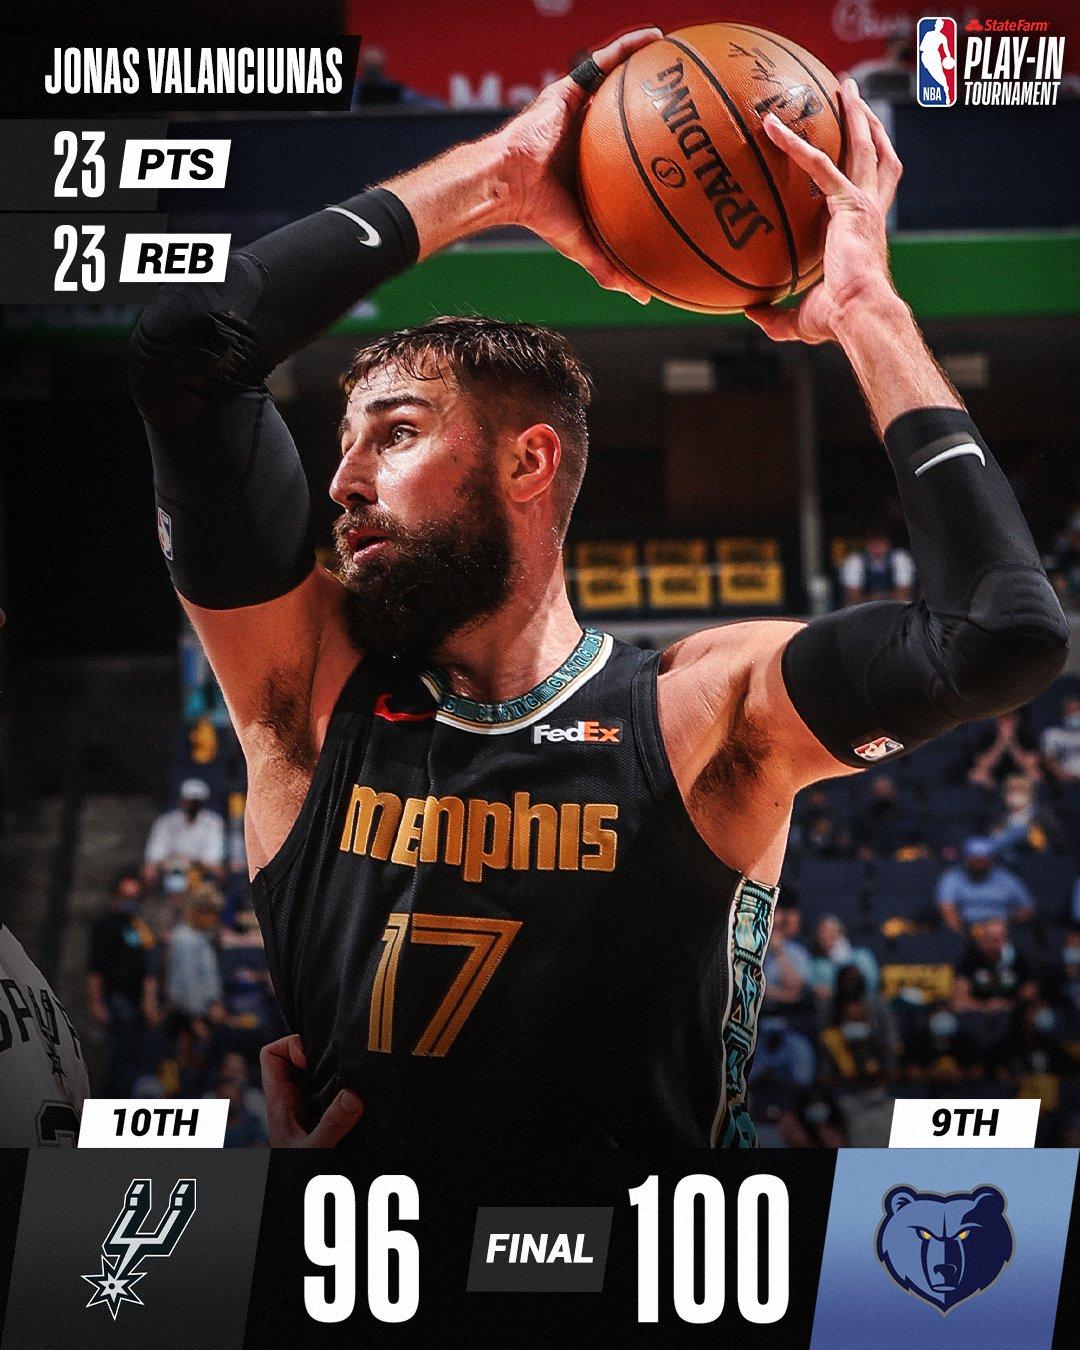 20-5-3